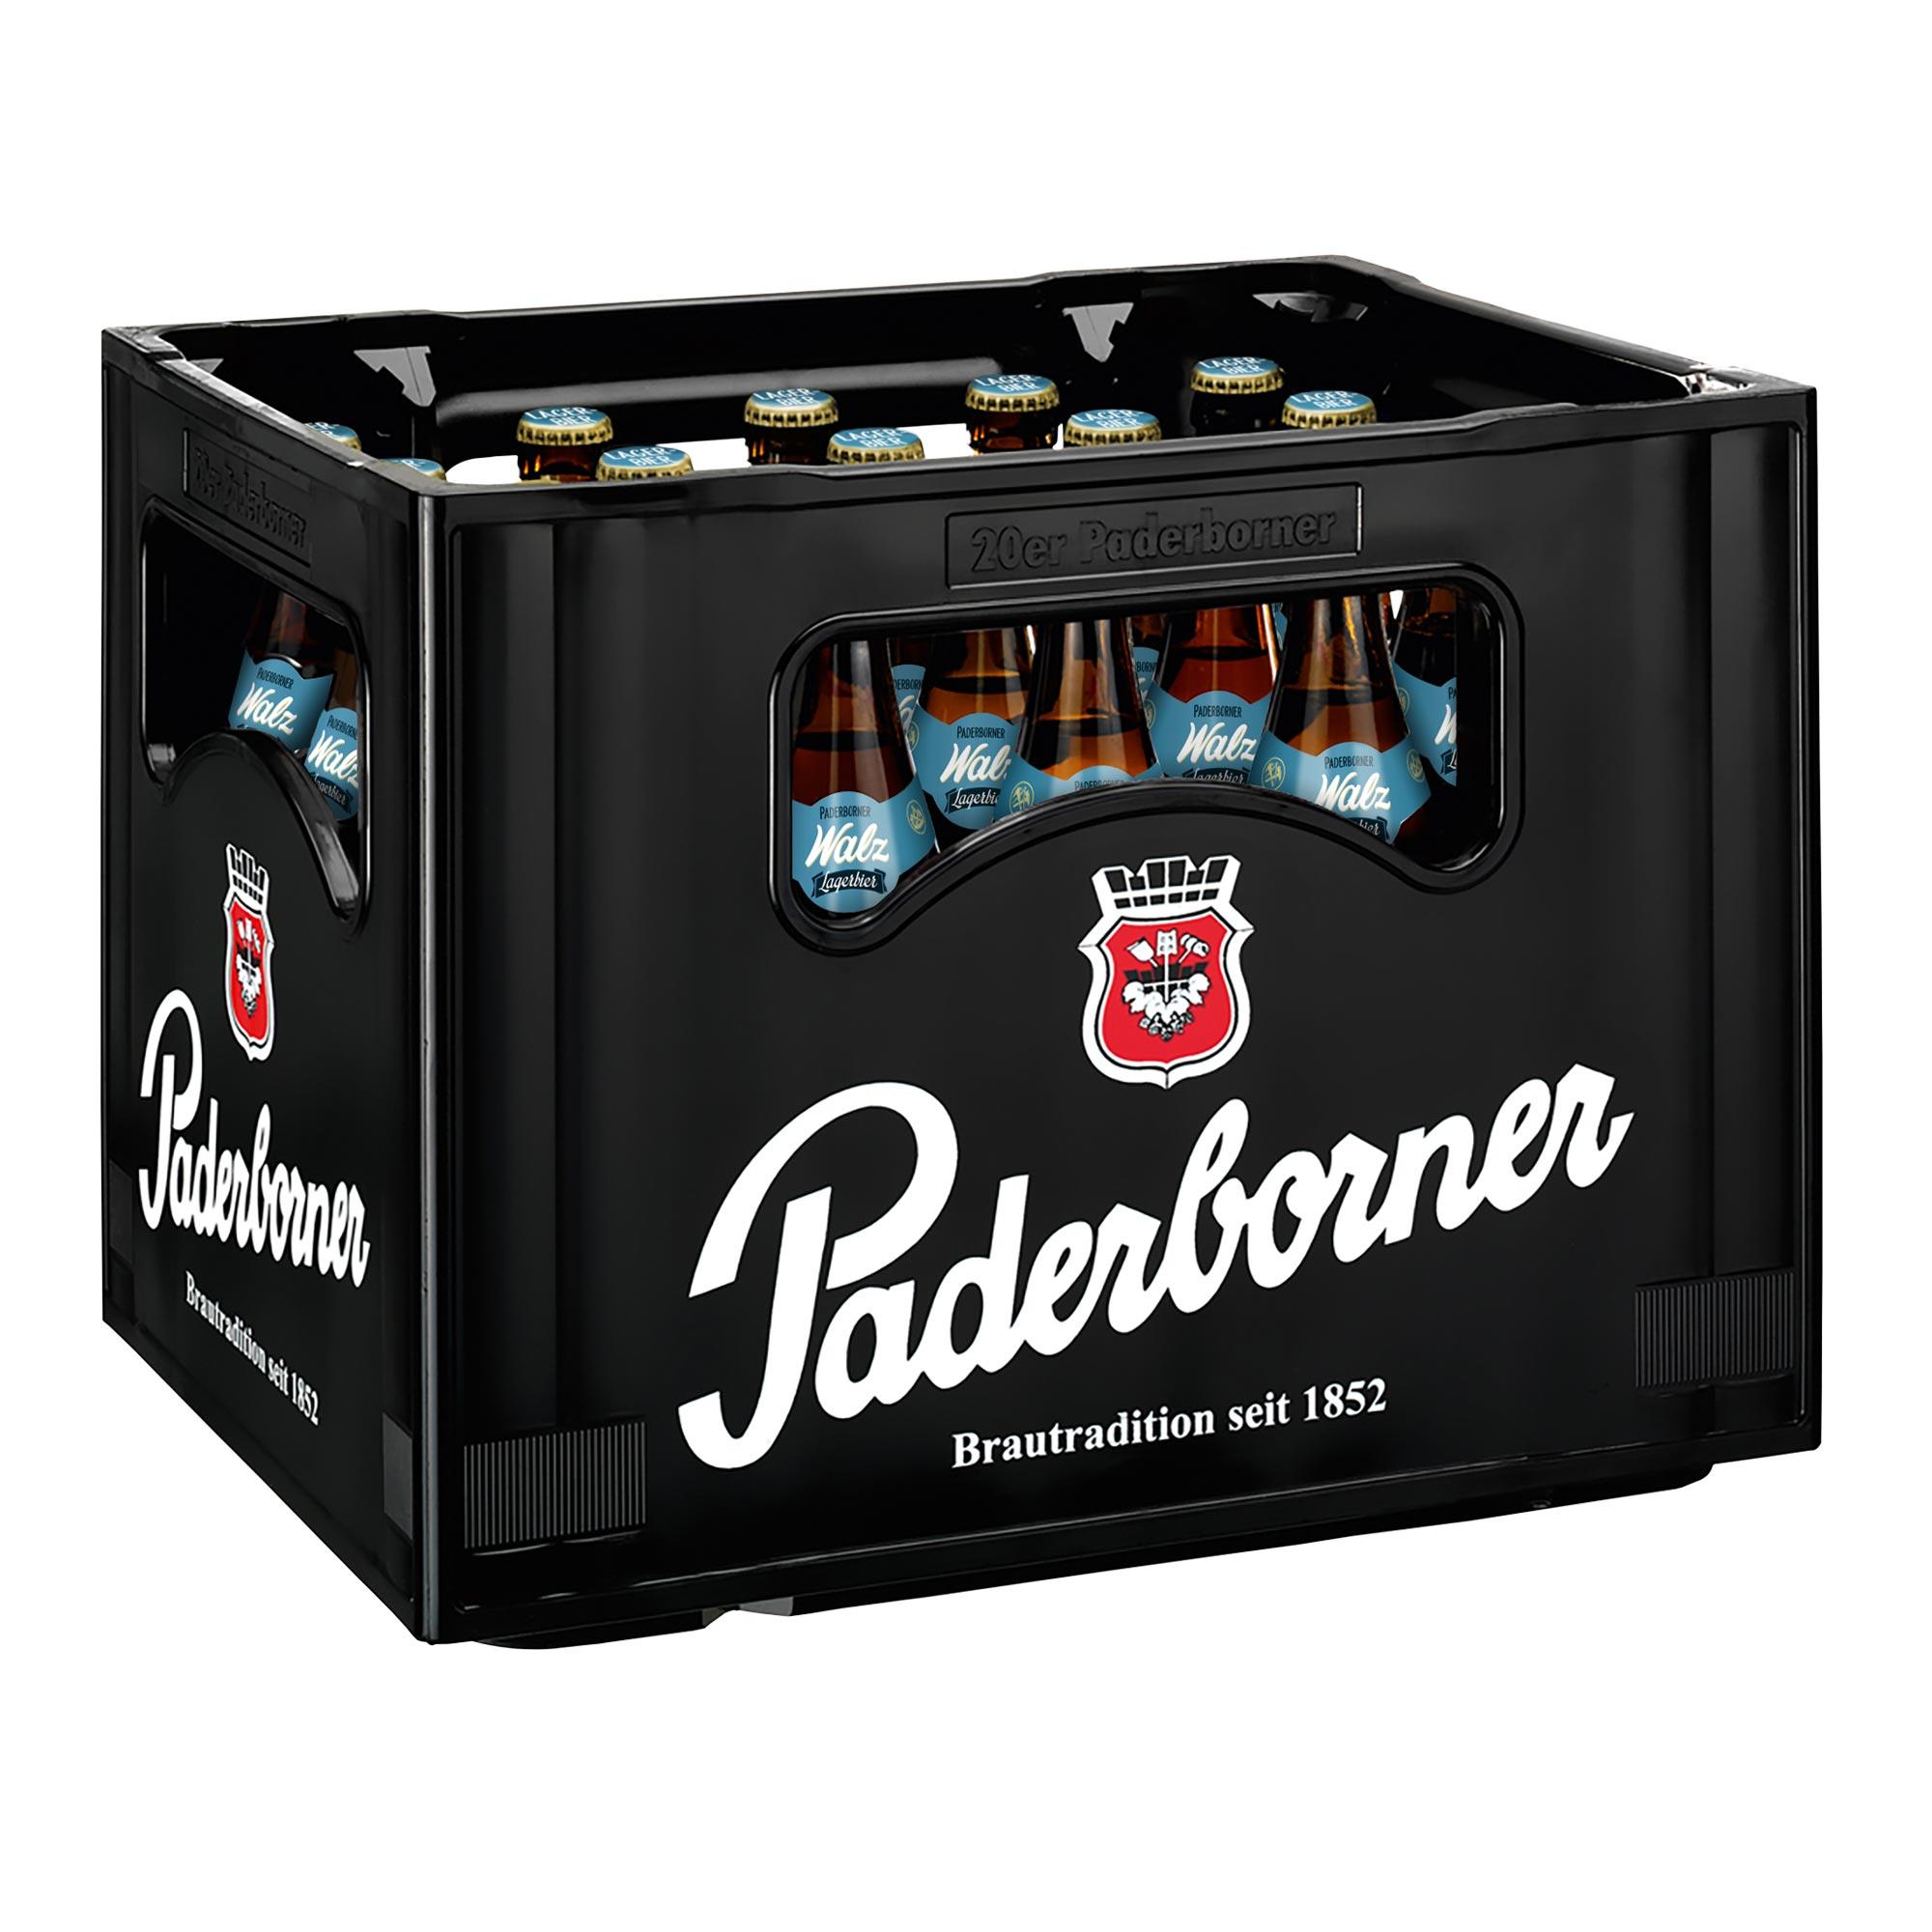 Produktabbildung Paderborner Walz Kasten 20 x 0,5 l